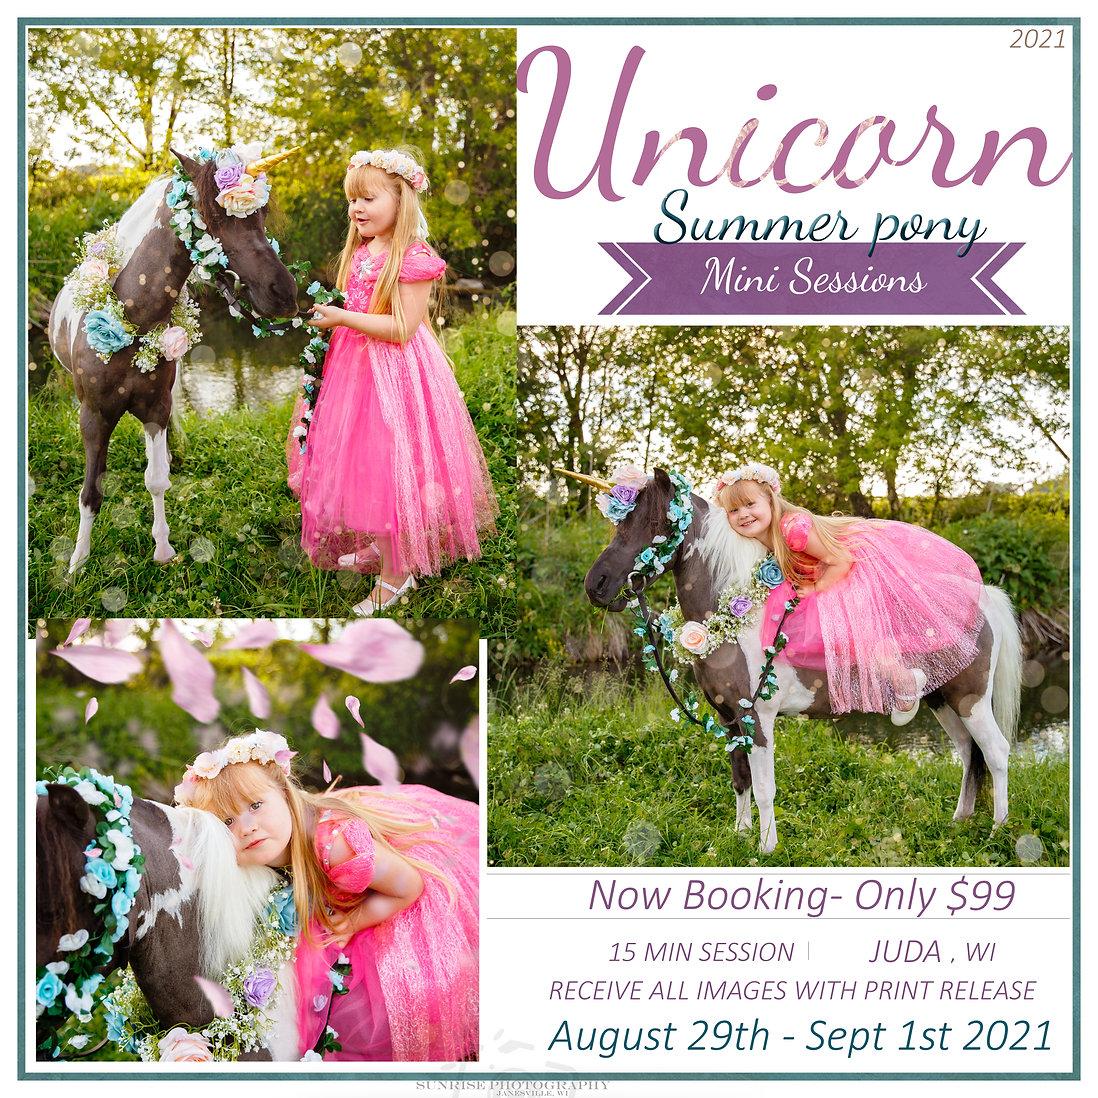 Unicorn FACEBOOK AD.jpg